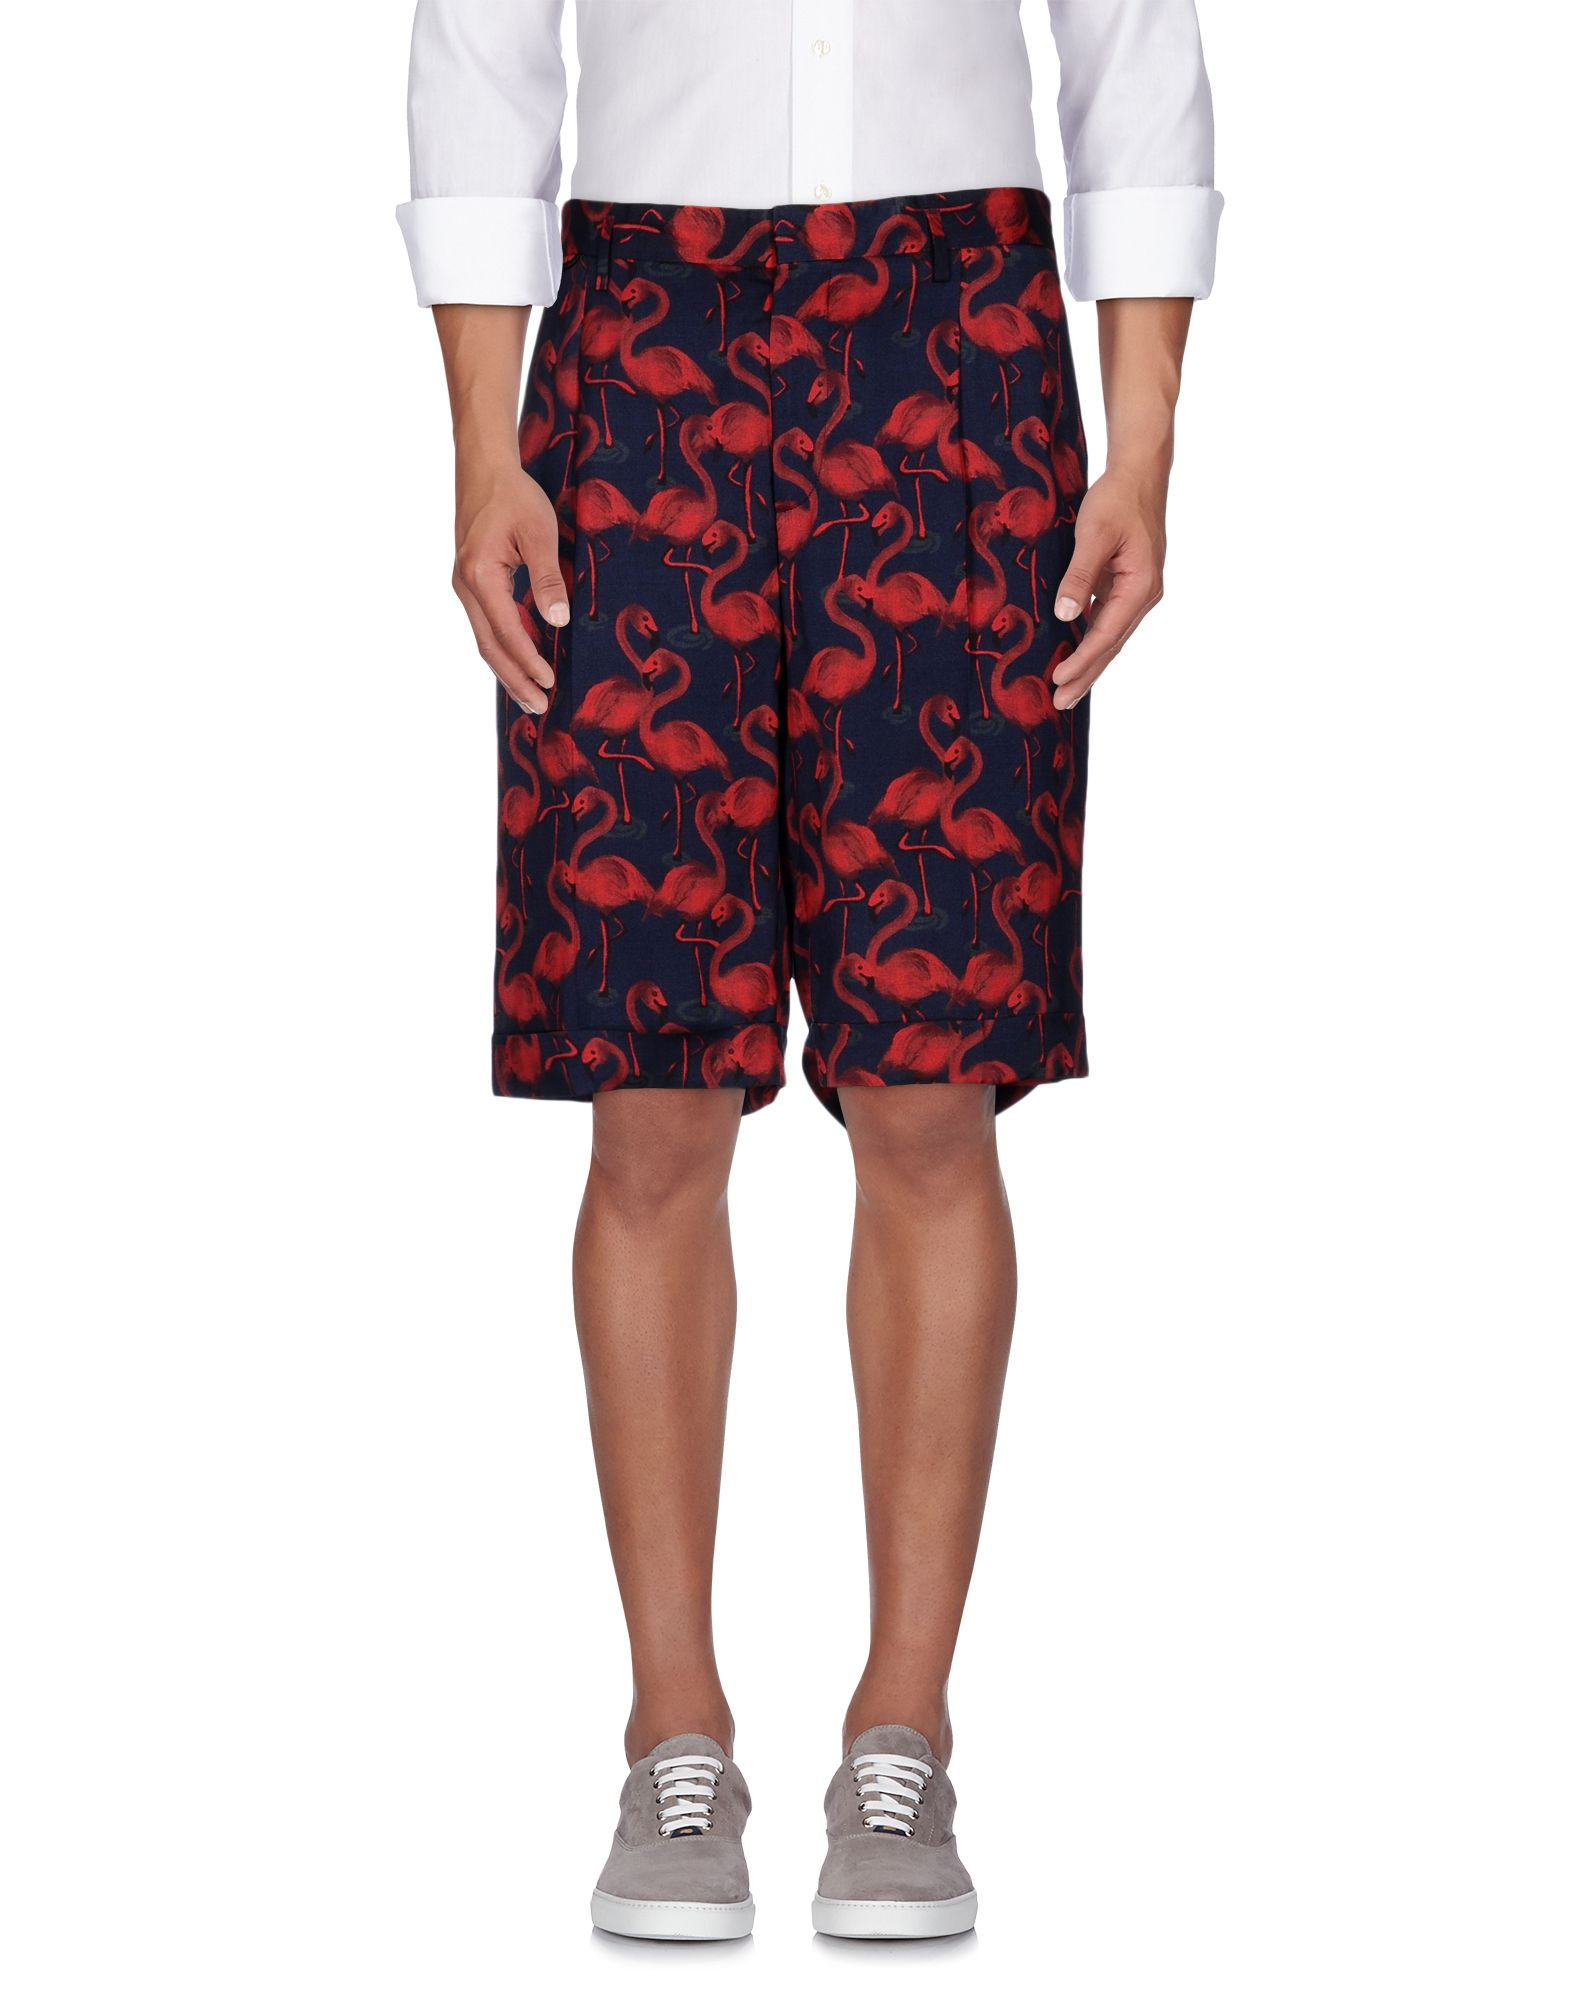 Pantalone Classico Marc Jacobs Uomo - Acquista online su